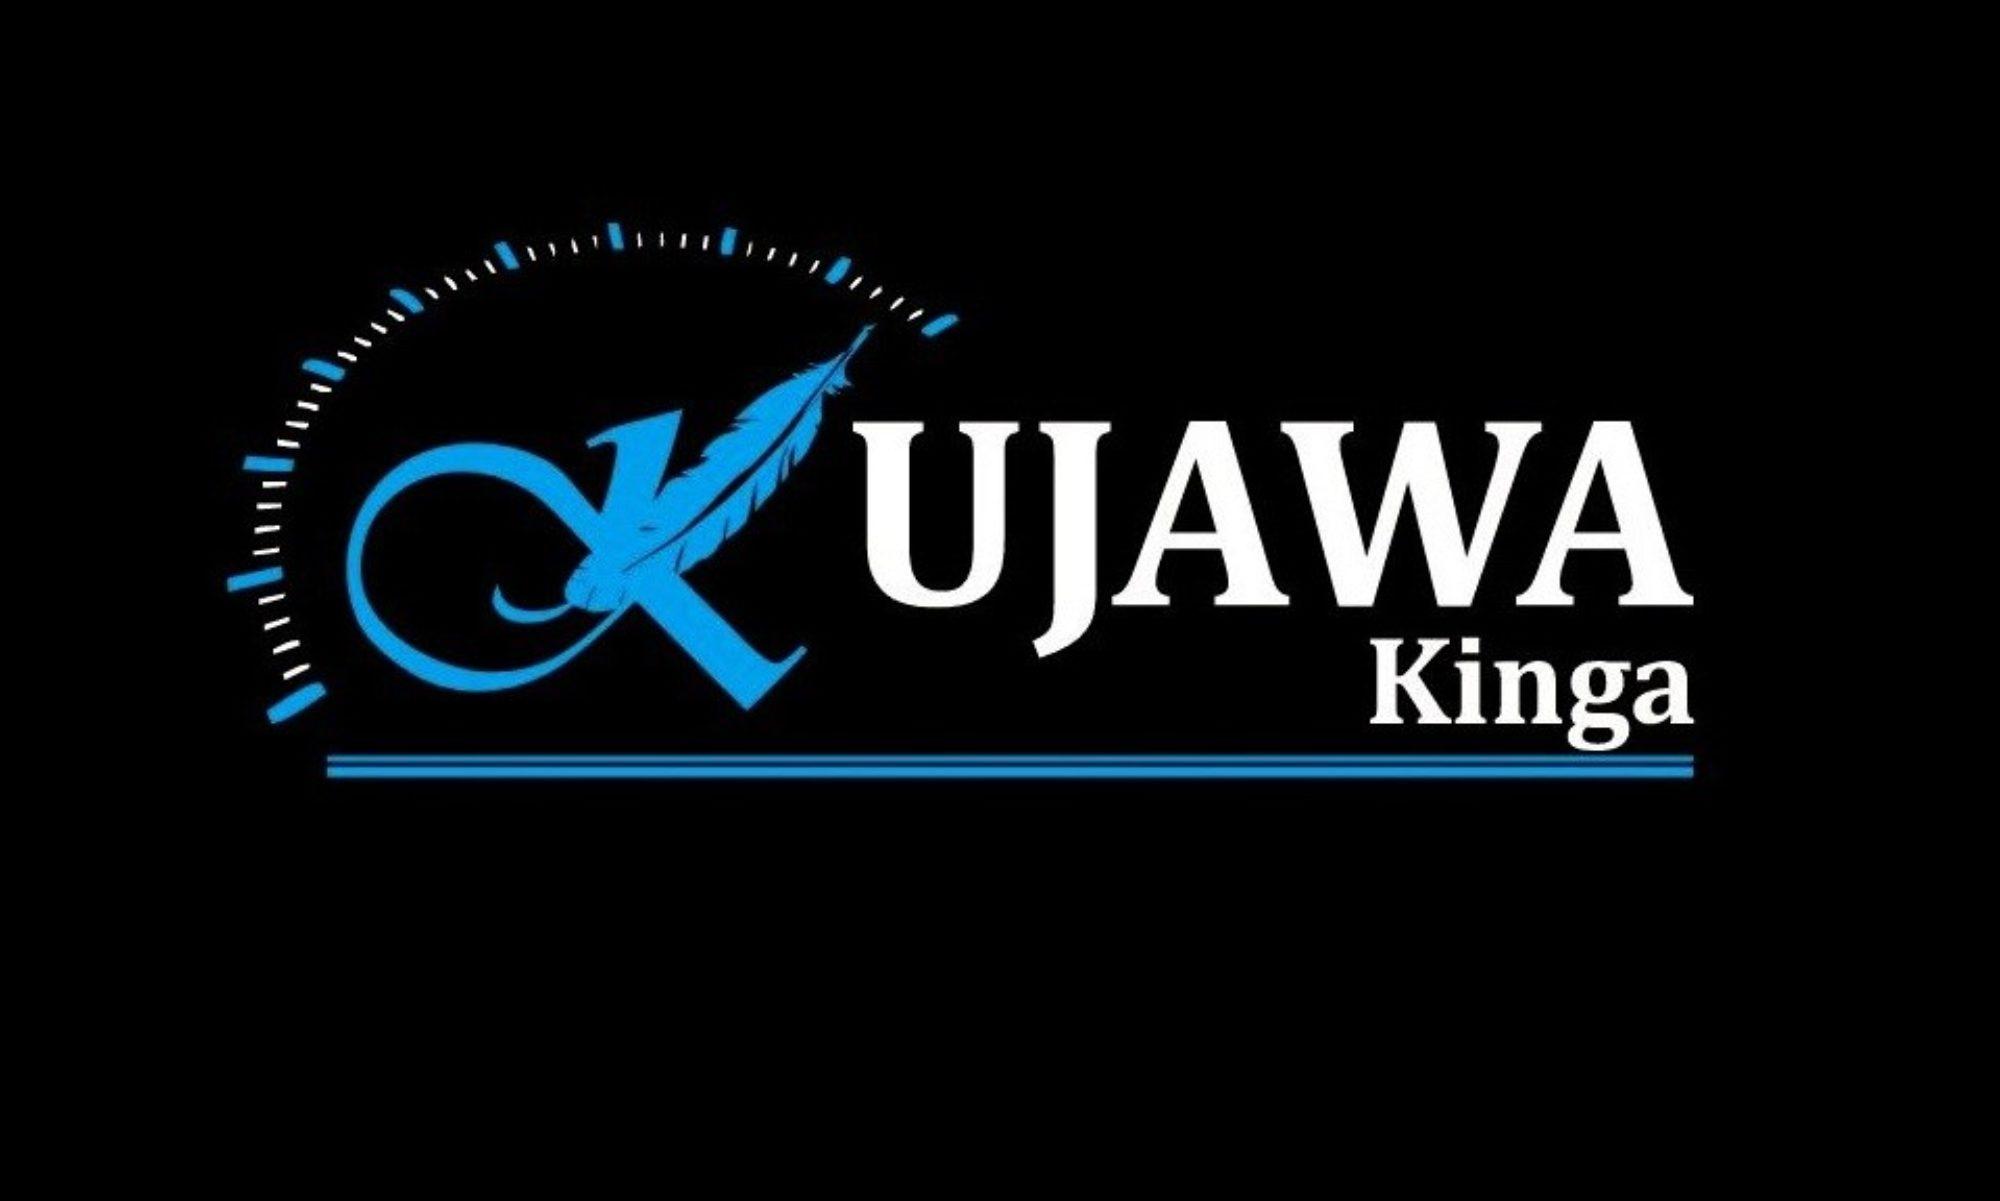 Akademia Kierowców Kinga Kujawa